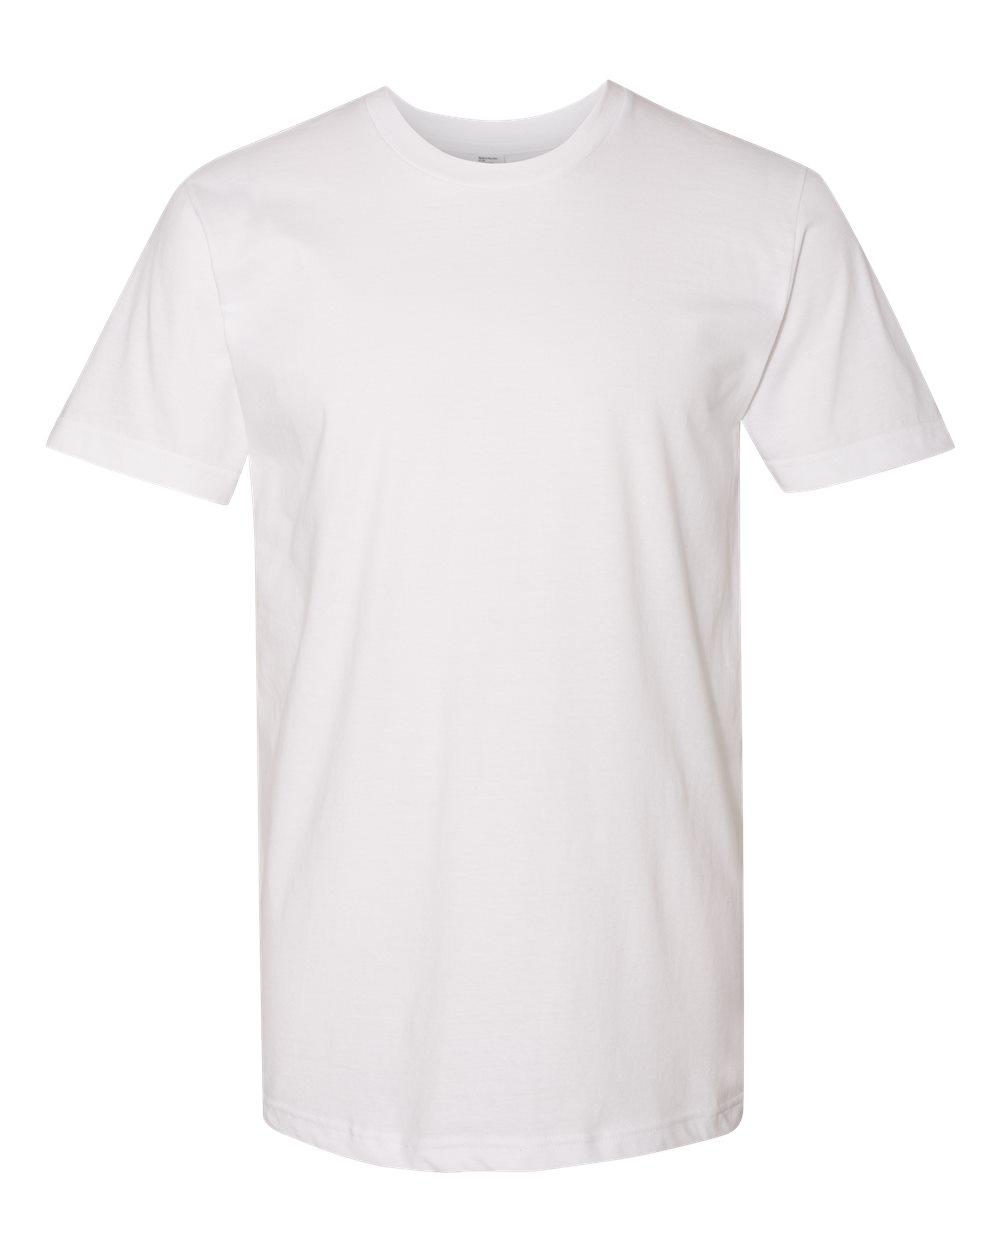 American-Apparel-Mens-Slim-Fit-50-50-Cotton-T-Shirt-Tee-BB401W-up-to-2XL thumbnail 51